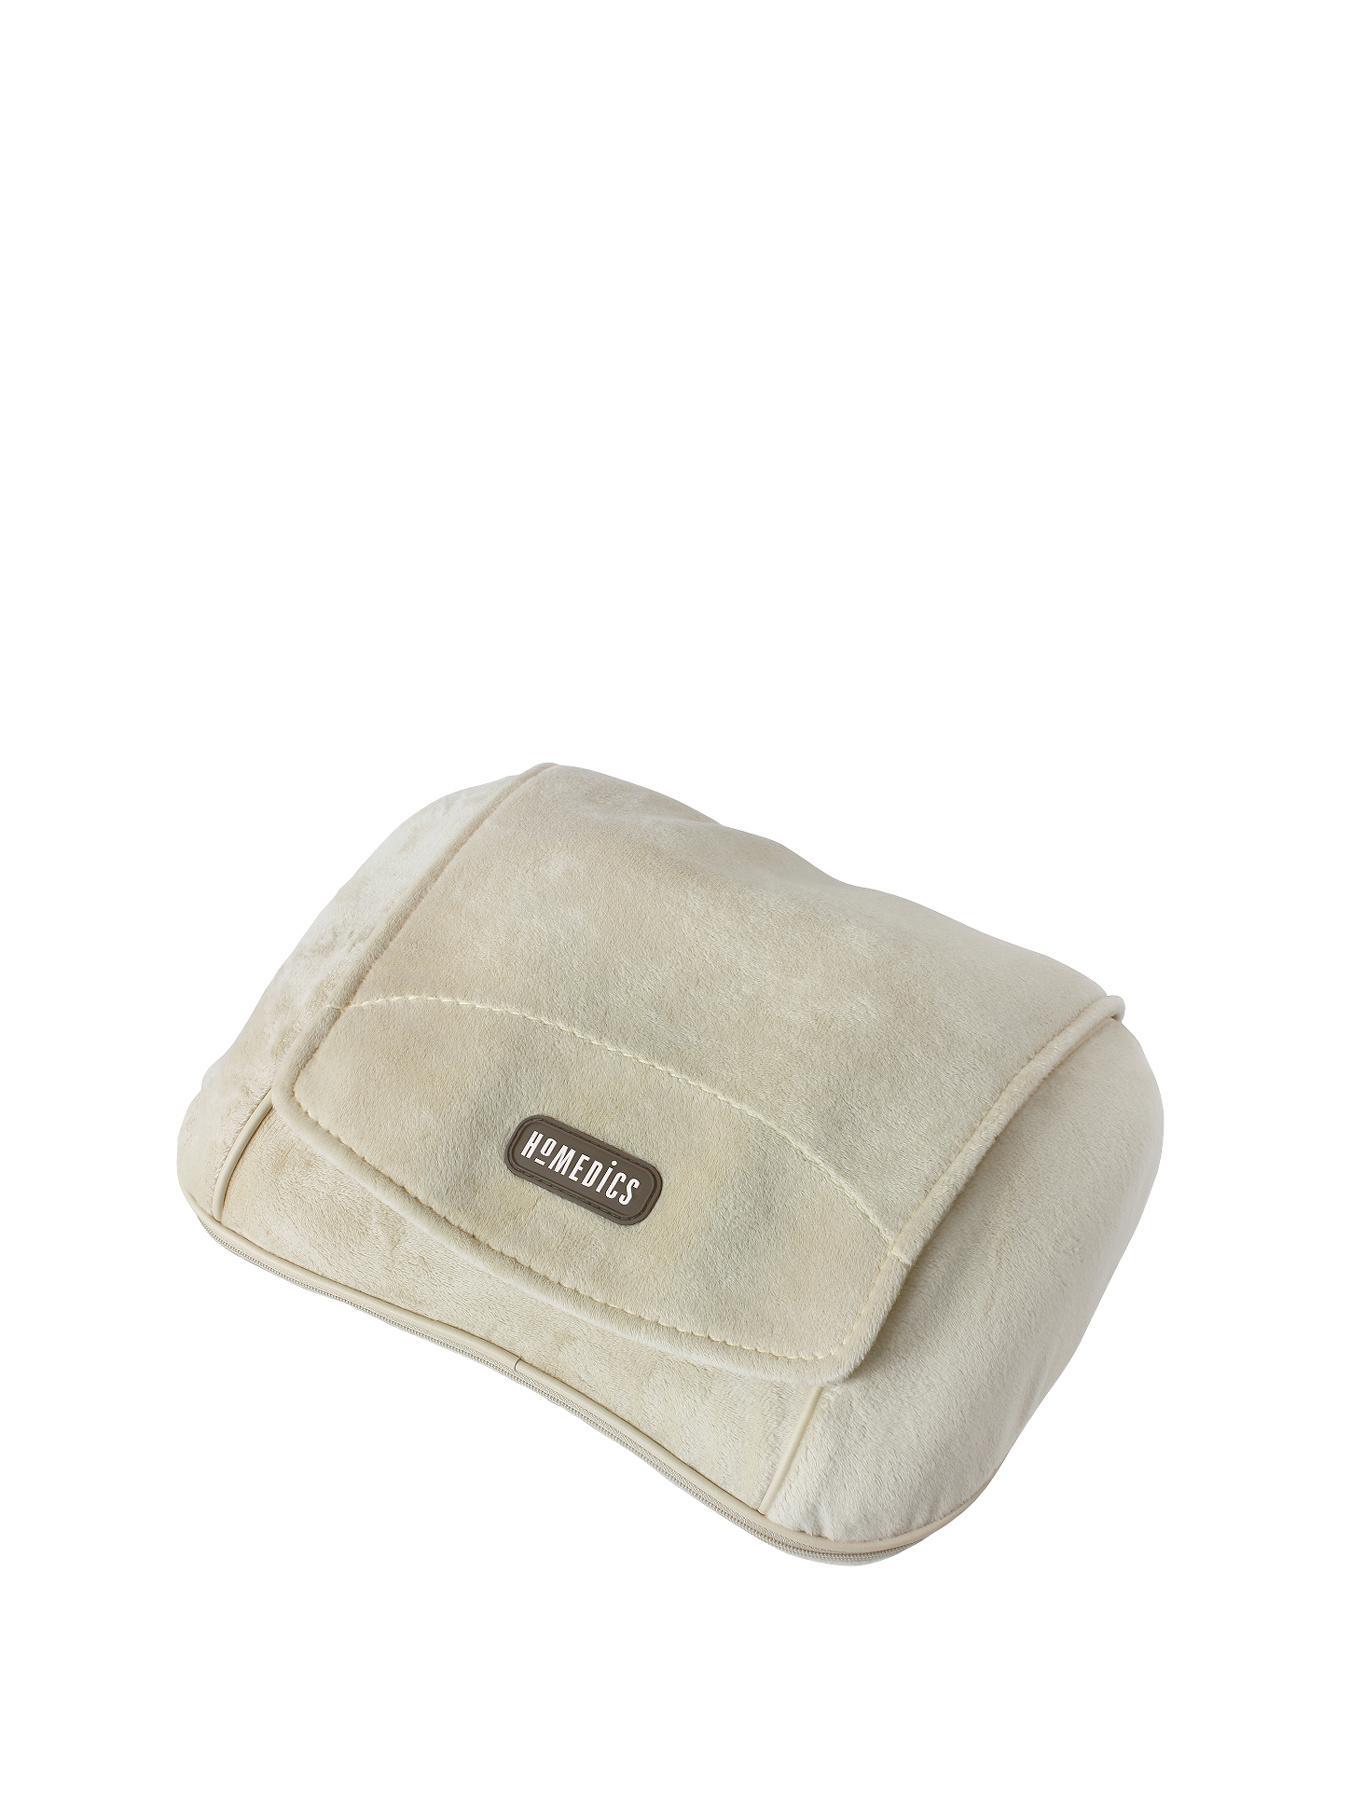 Homedics Shiatsu Massage Pillow - Grey